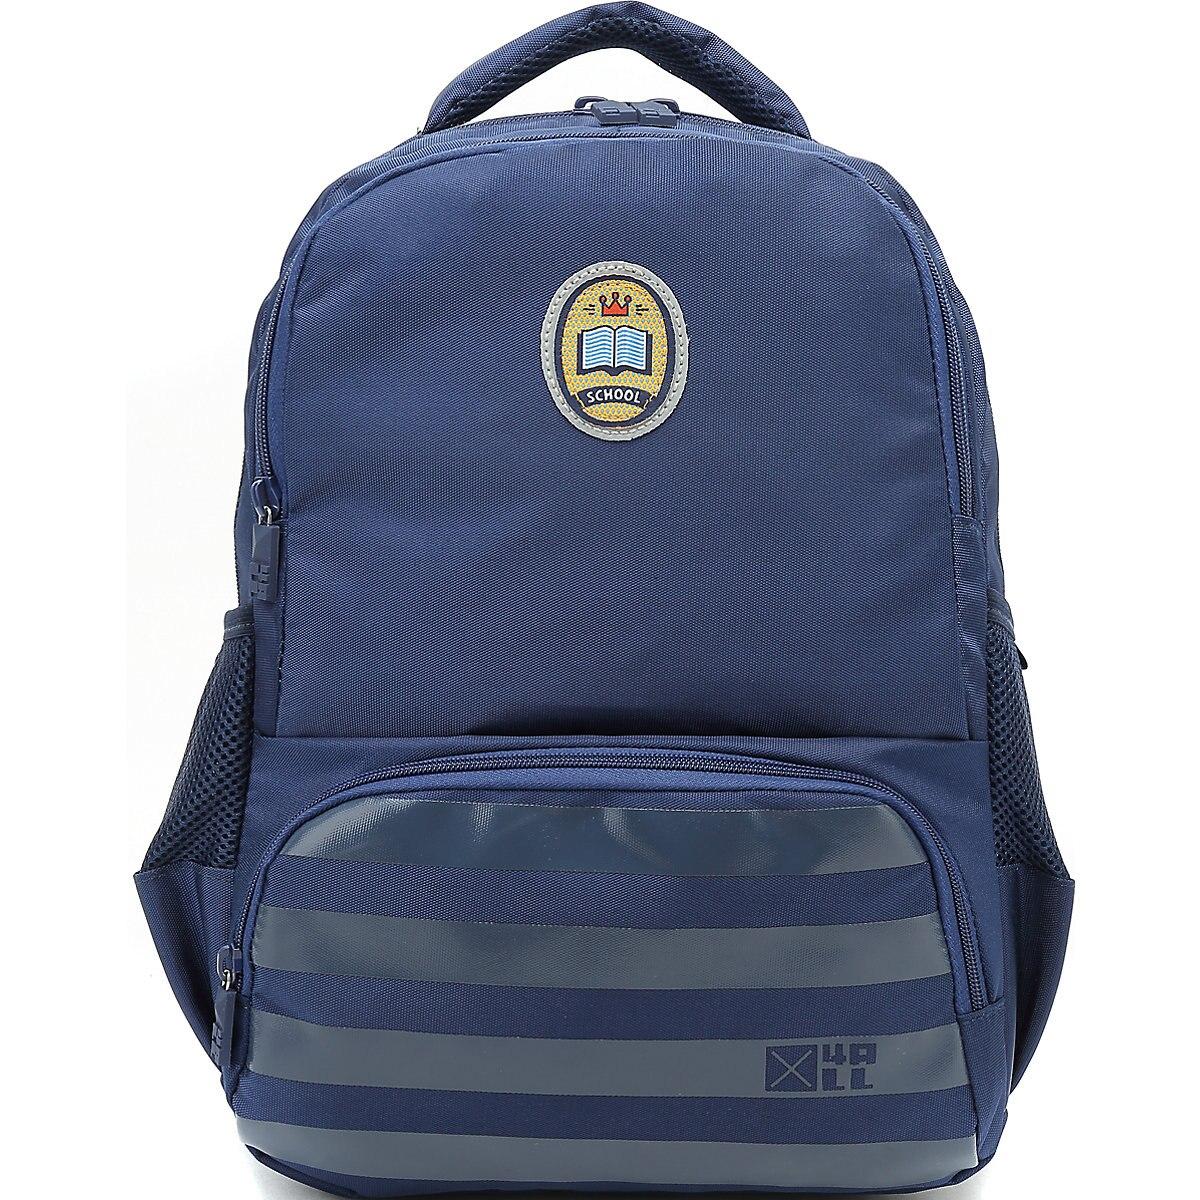 4ALL School Bags 11857780 Schoolbag Backpack Orthopedic Bag For Boy And Girl Animals MTpromo